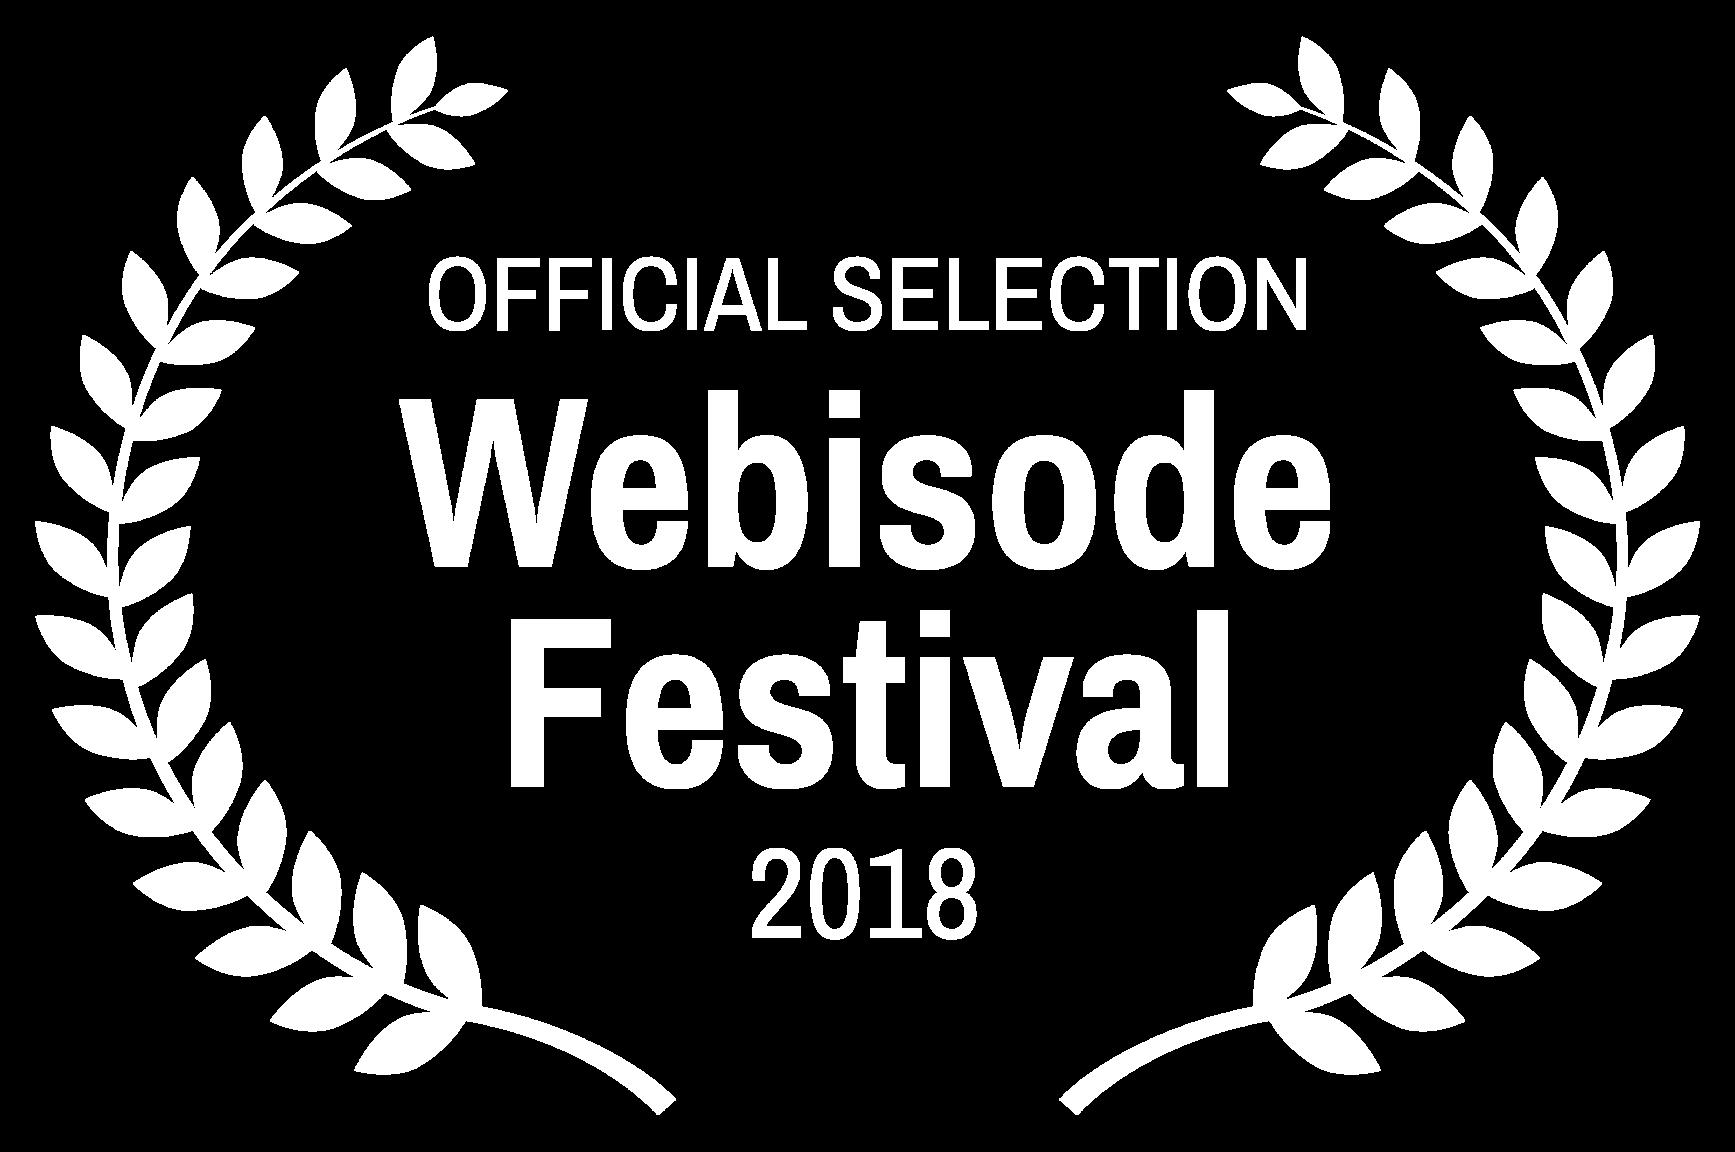 OFFICIAL SELECTION - Webisode Festival - 2018.png